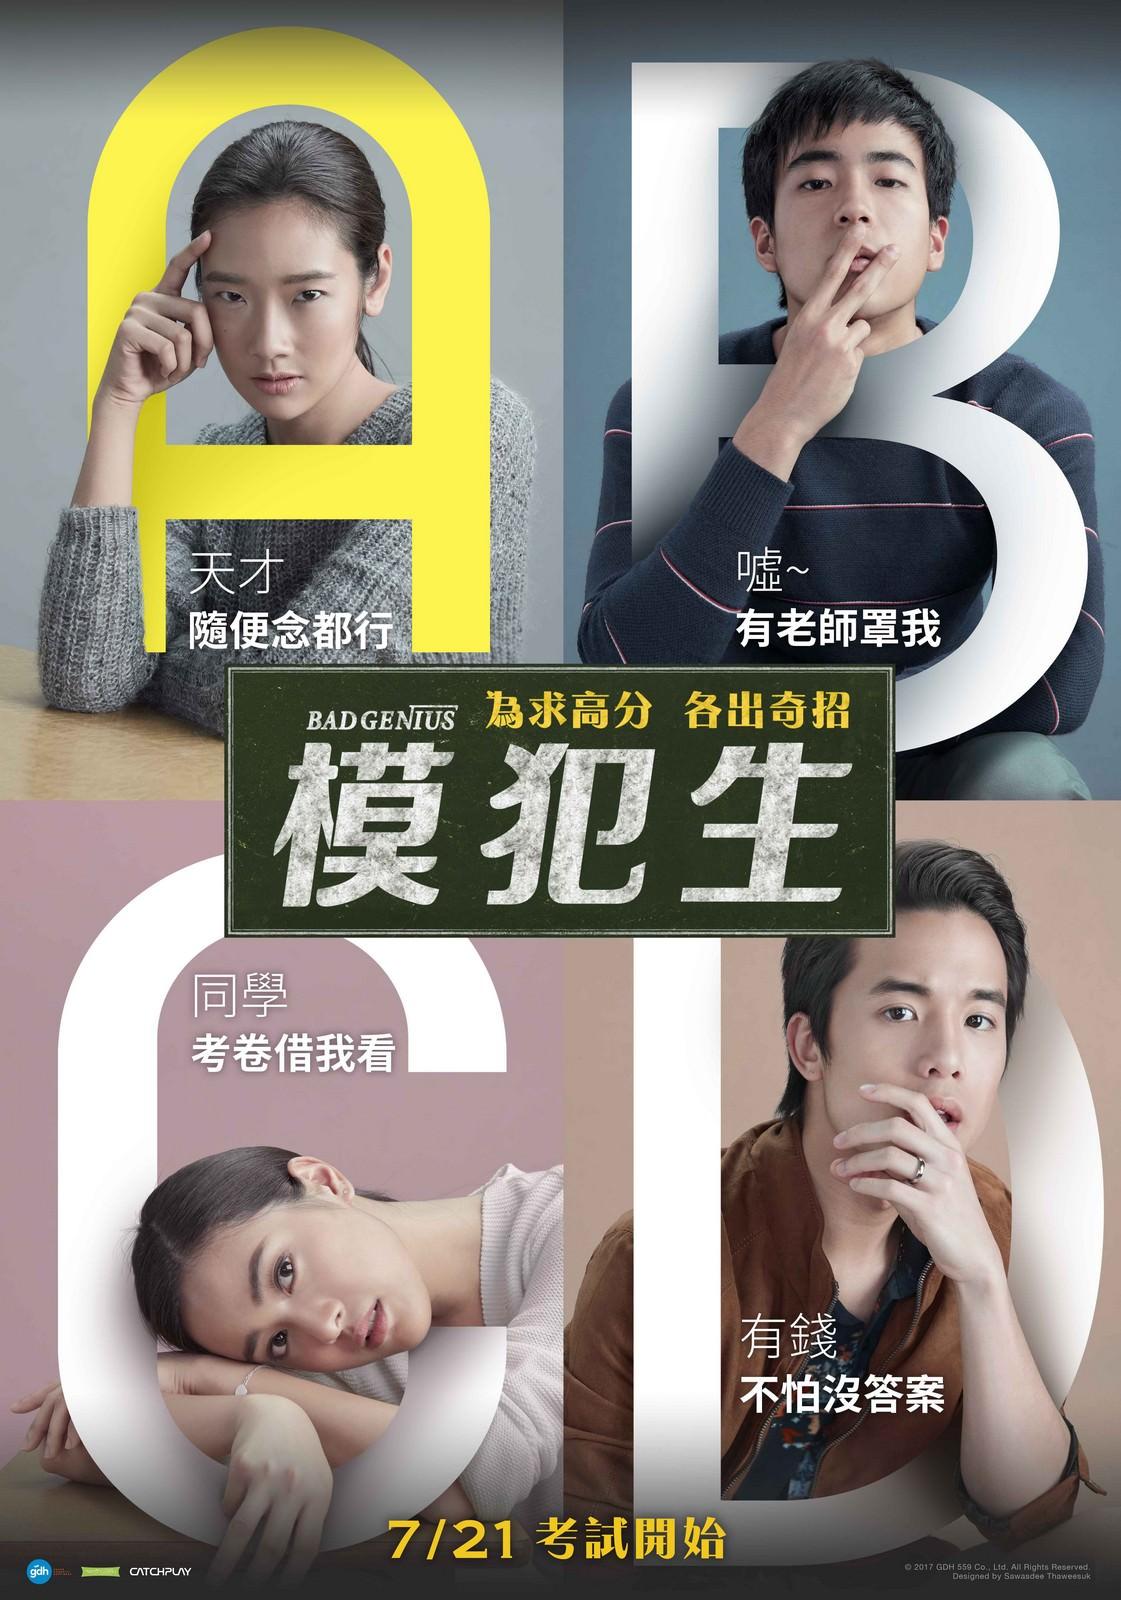 Movie, ฉลาดเกมส์โกง(泰國, 2017年) / 模犯生(台灣) / 天才枪手(中國) / 出貓特攻隊(香港) / Bad Genius(英文), 電影海報, 台灣